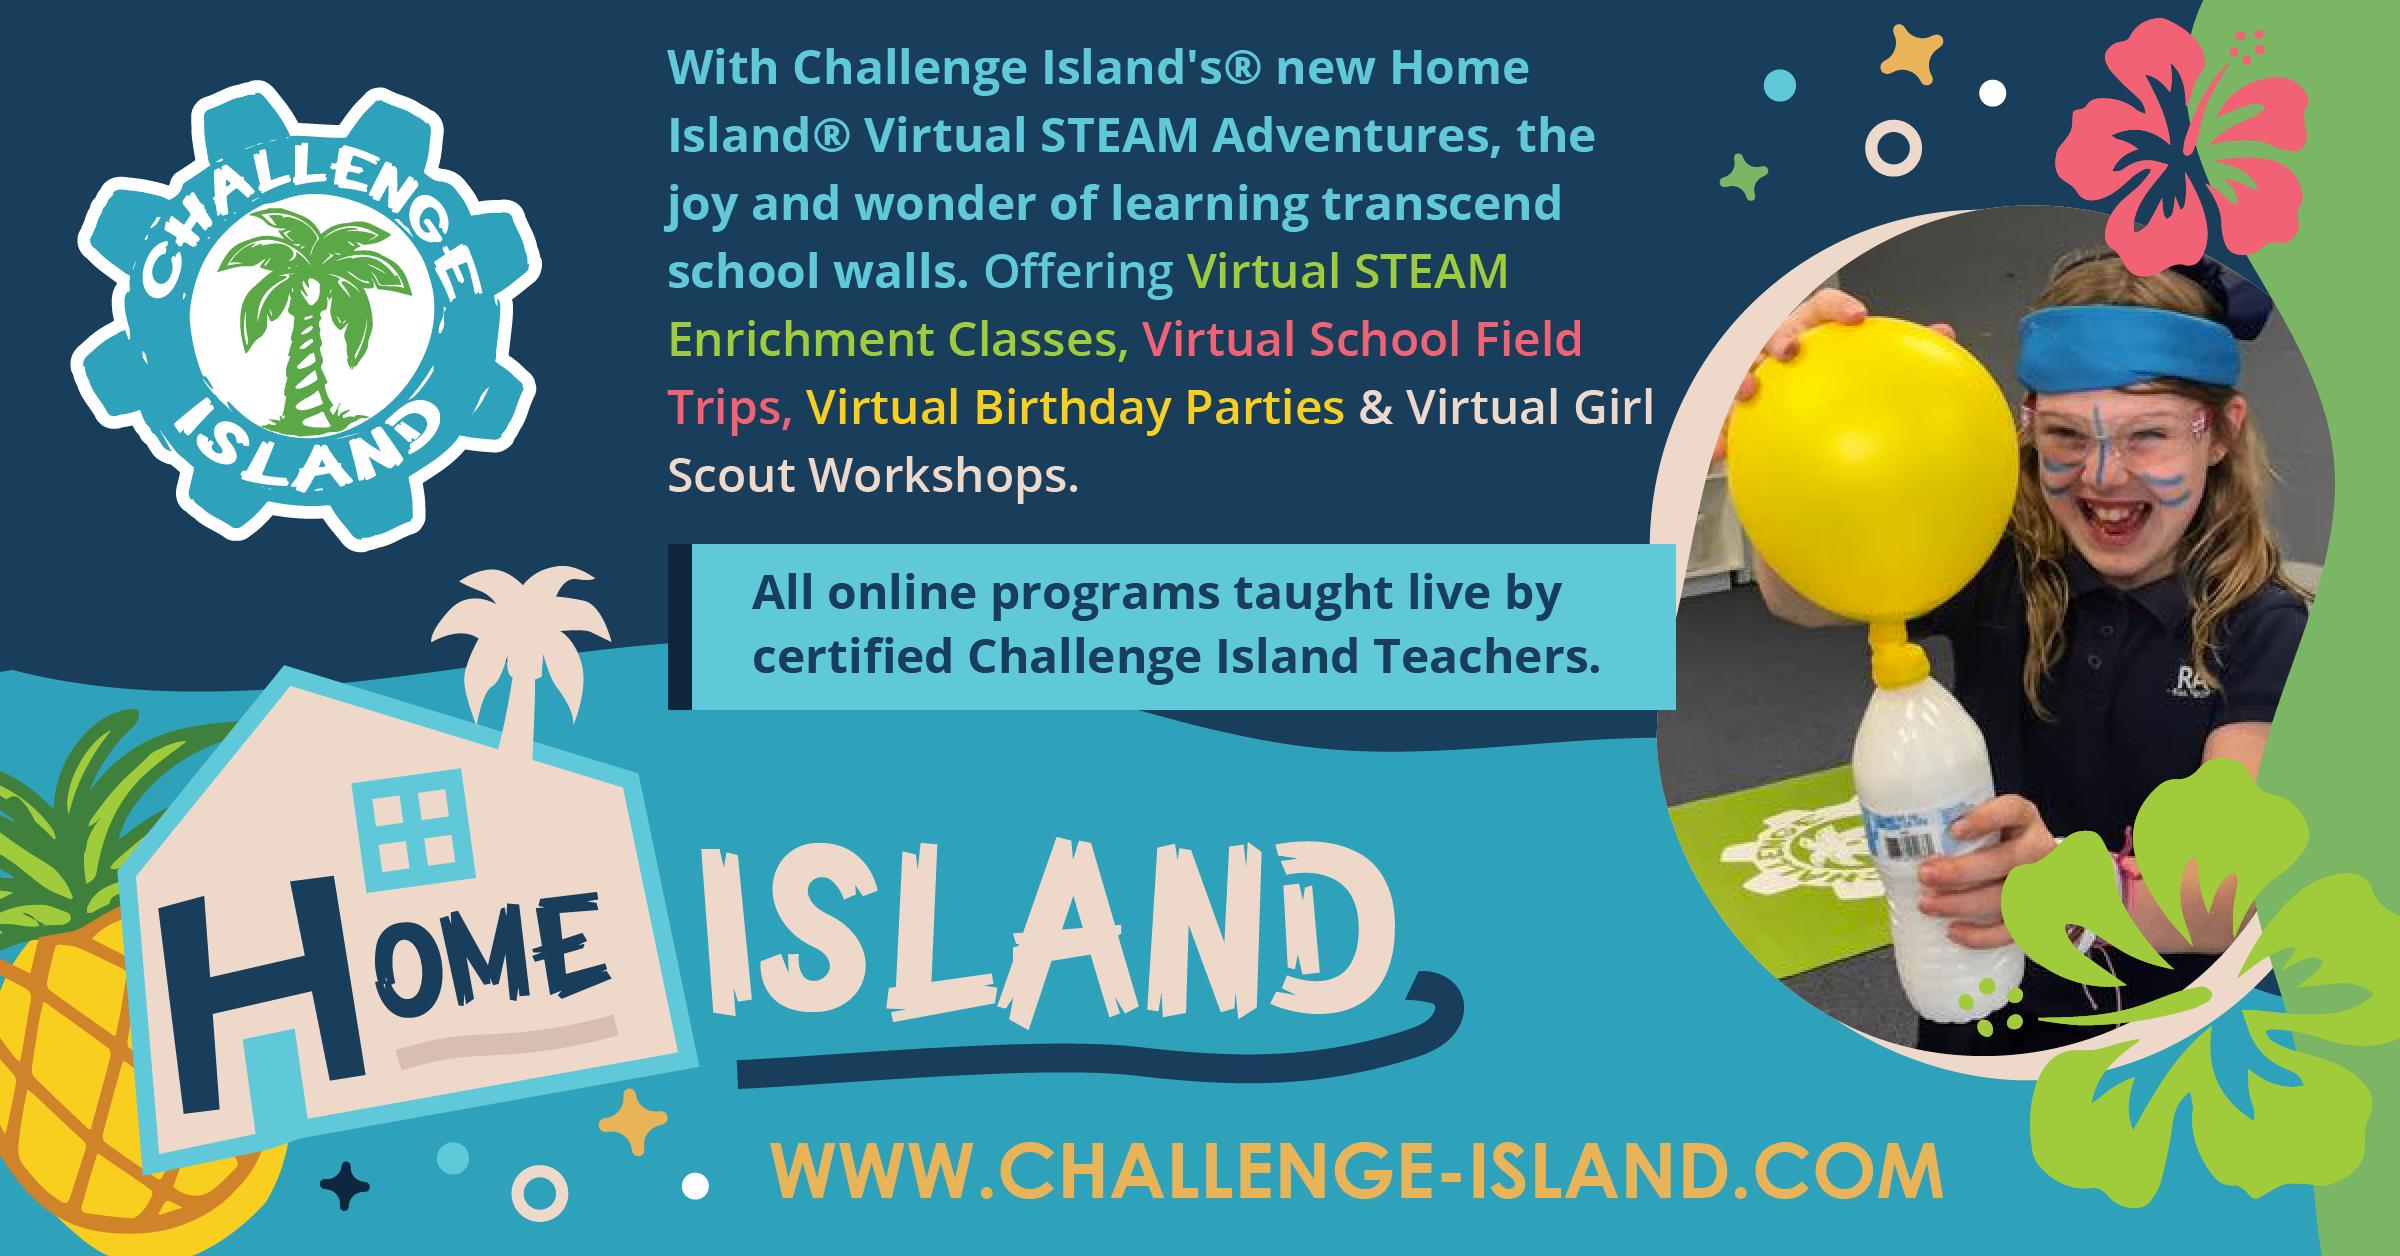 With Challenge Island's Home Island Virtual STEAM